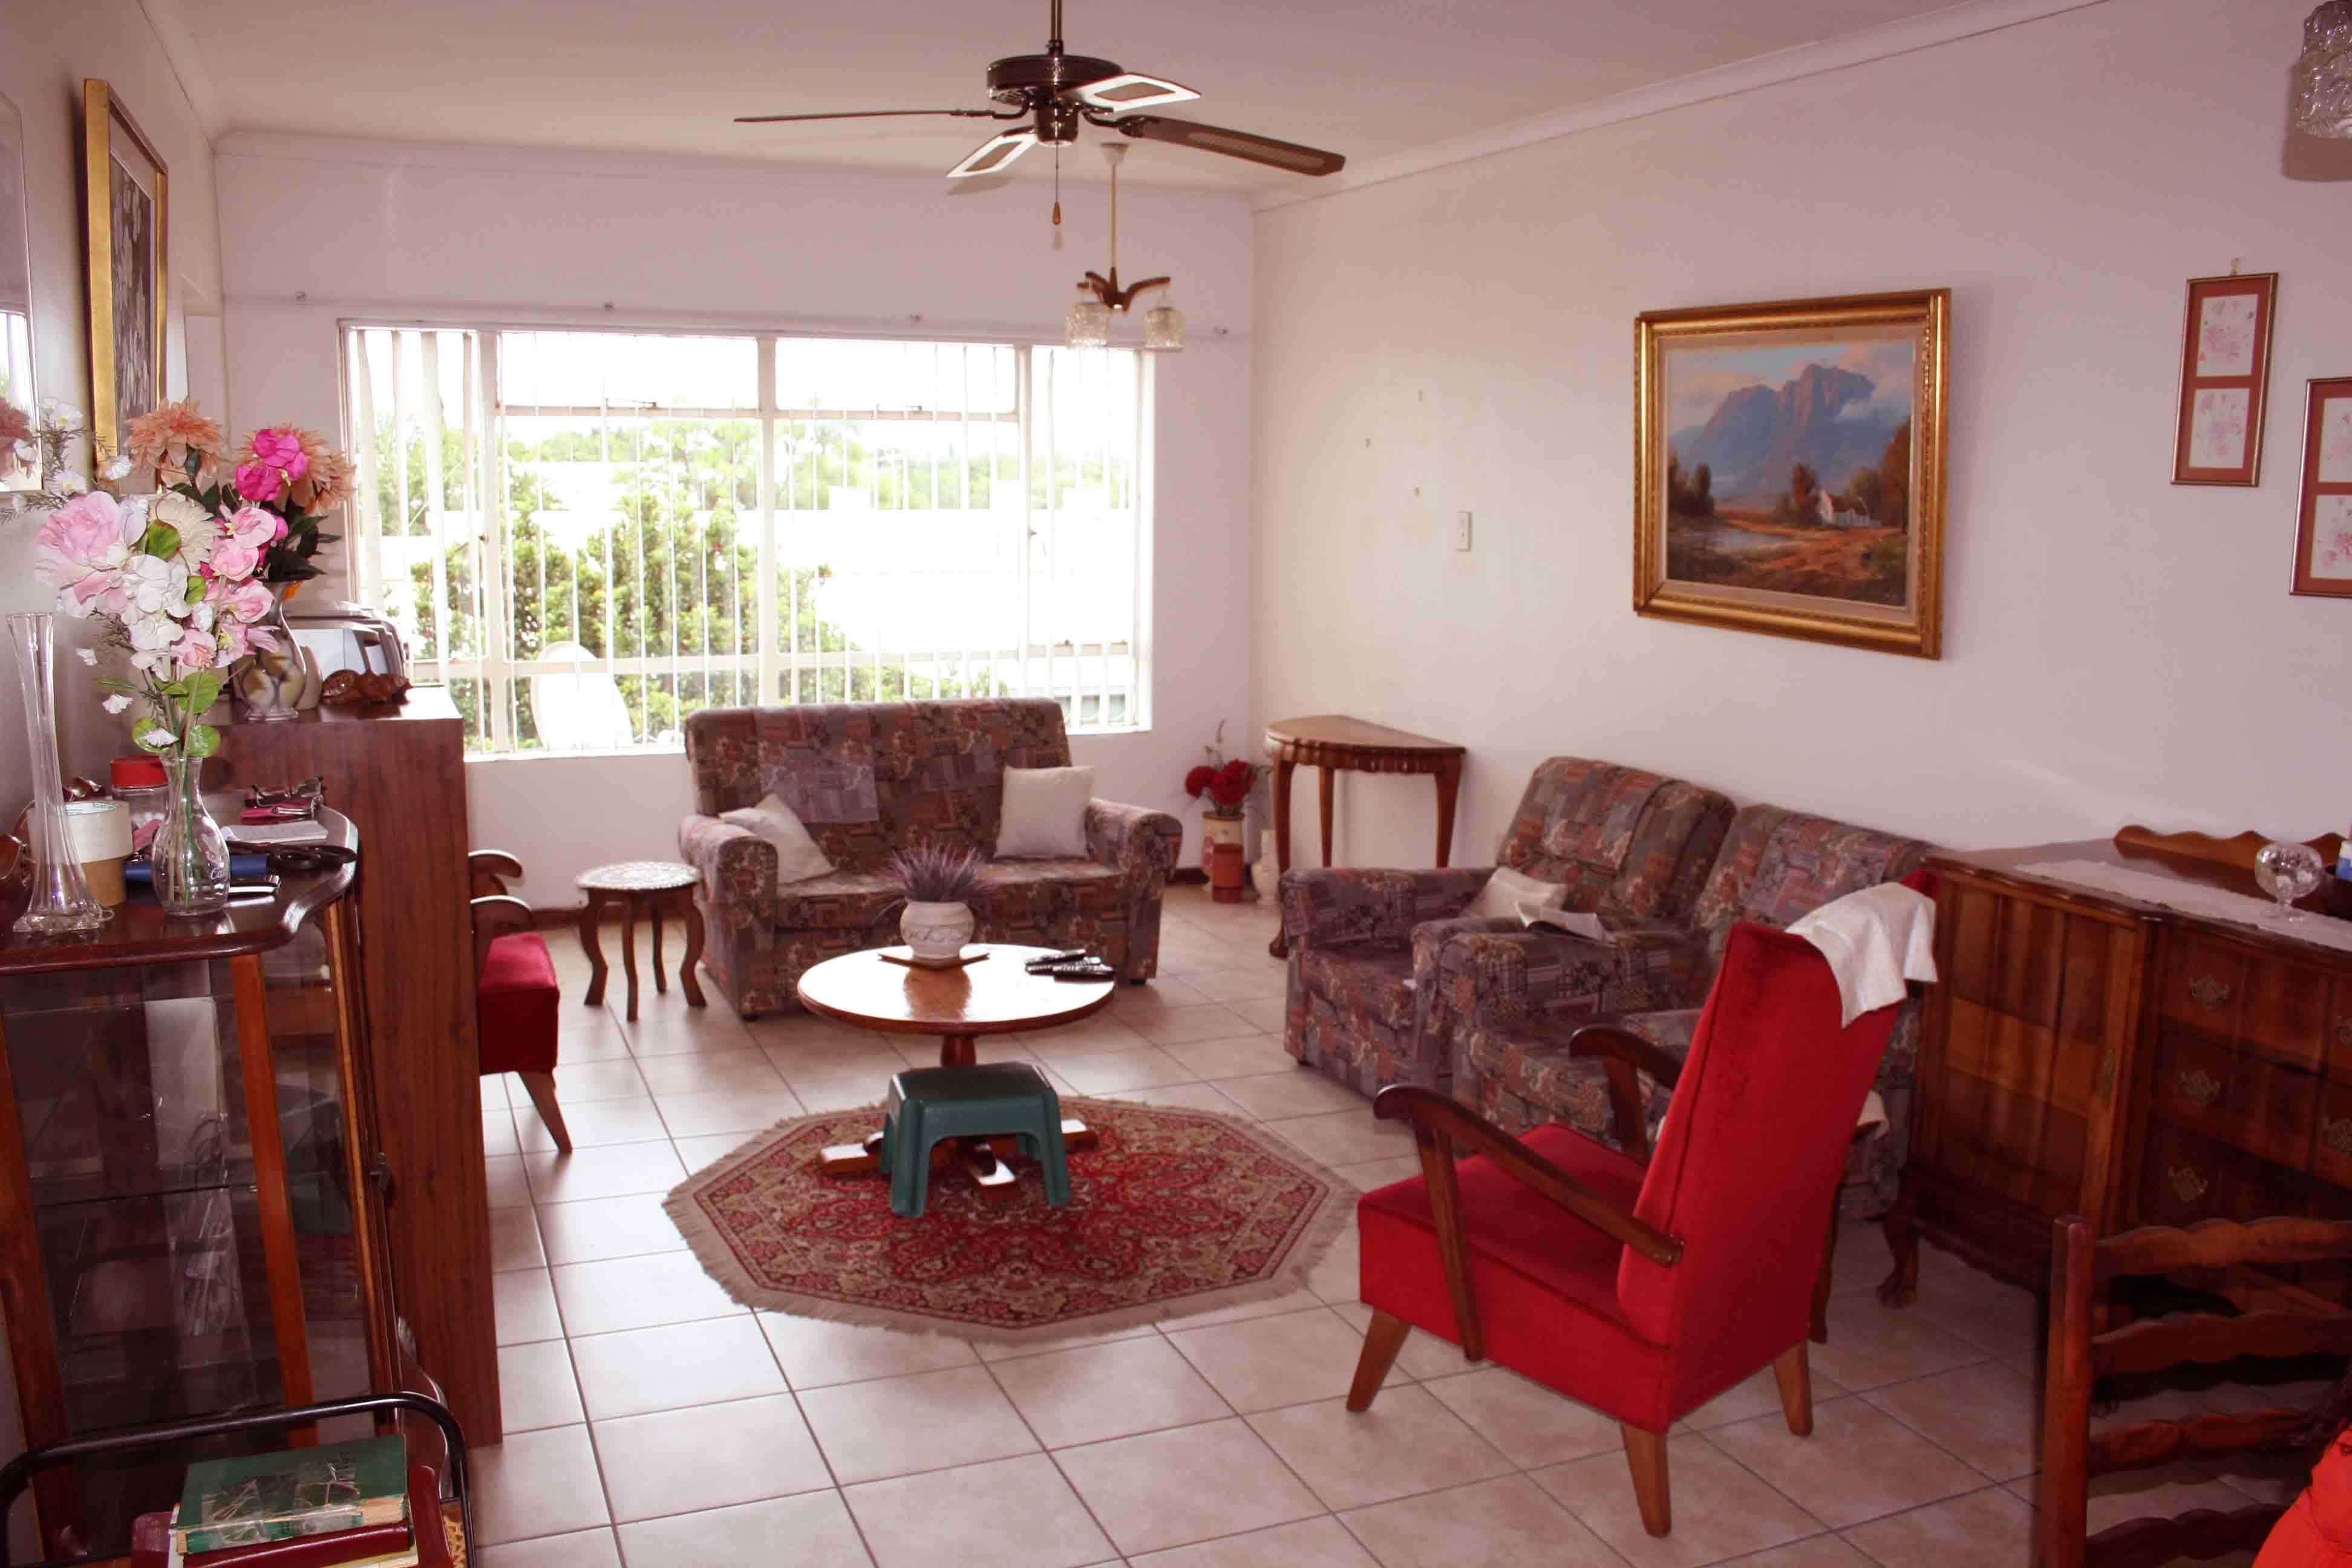 3 BedroomApartment Pending Sale In Potchefstroom Central